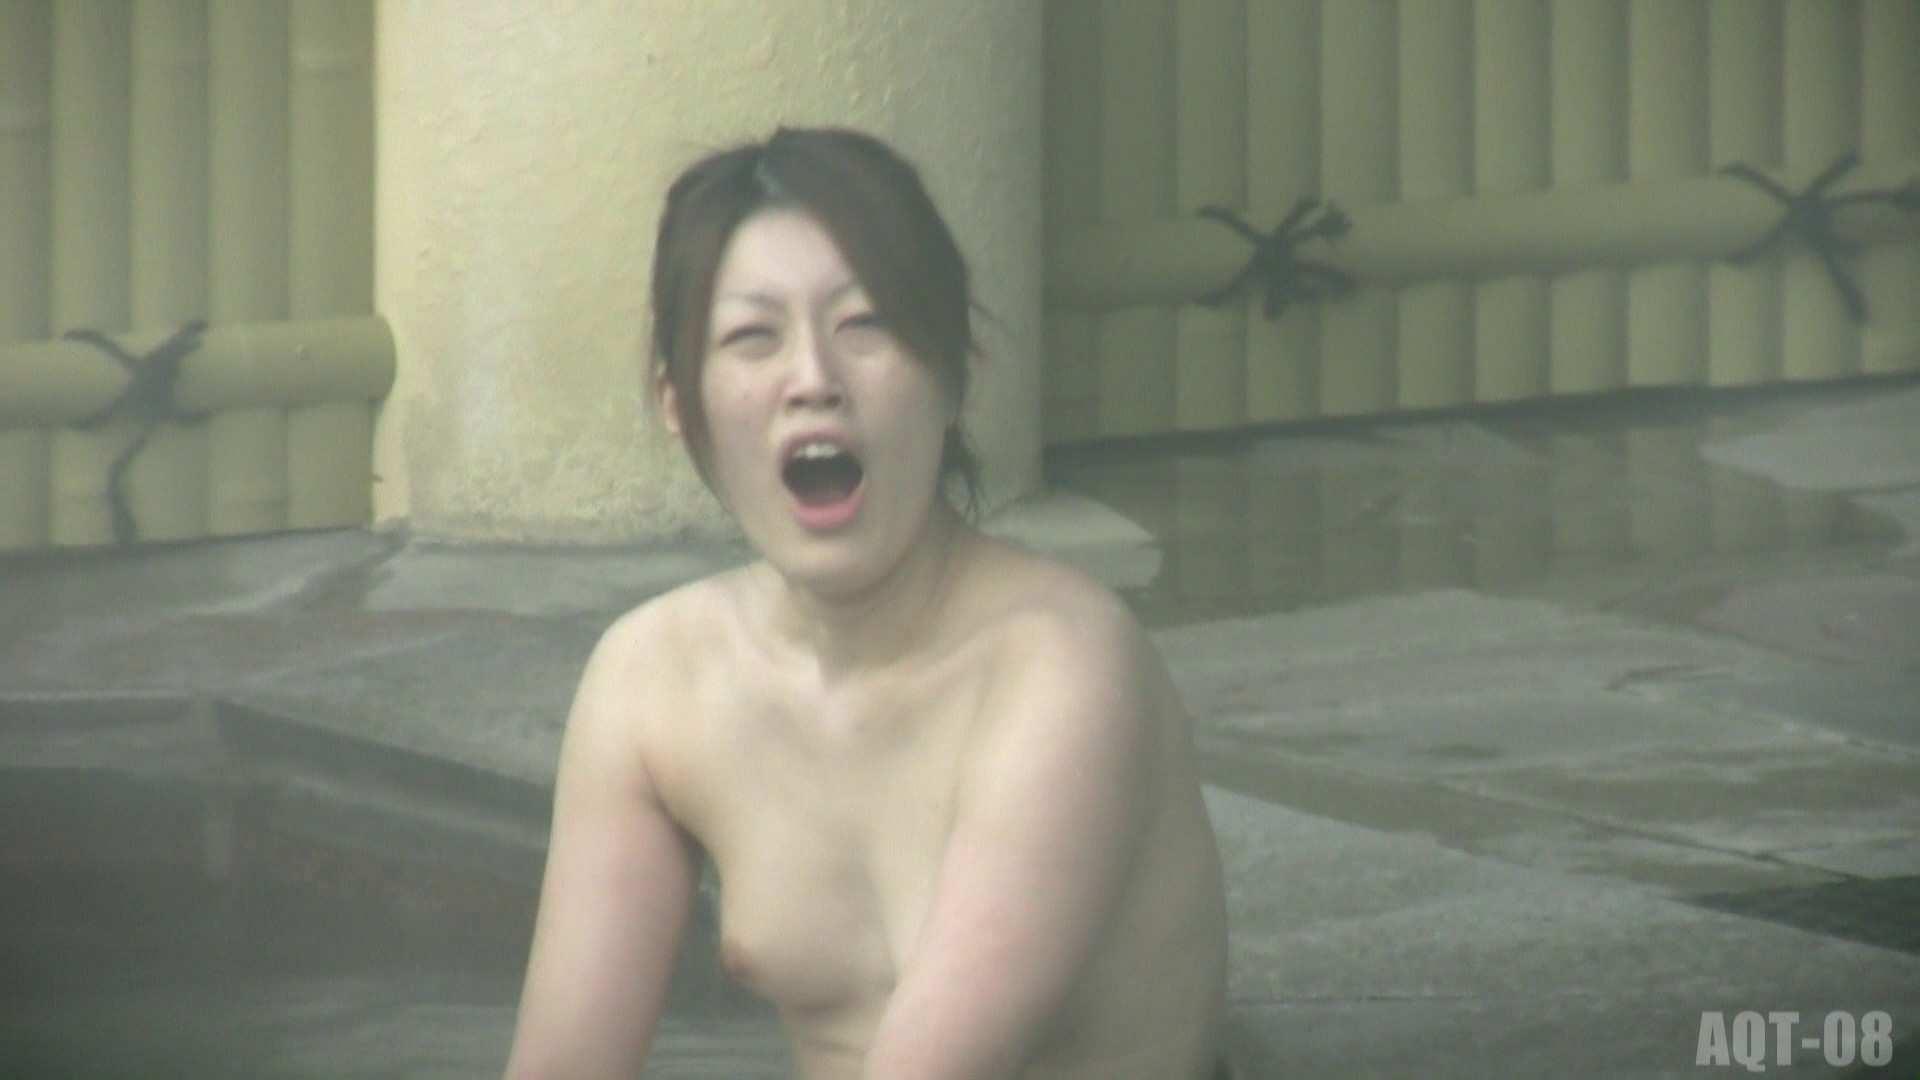 Aquaな露天風呂Vol.775 盗撮映像  74Pix 2